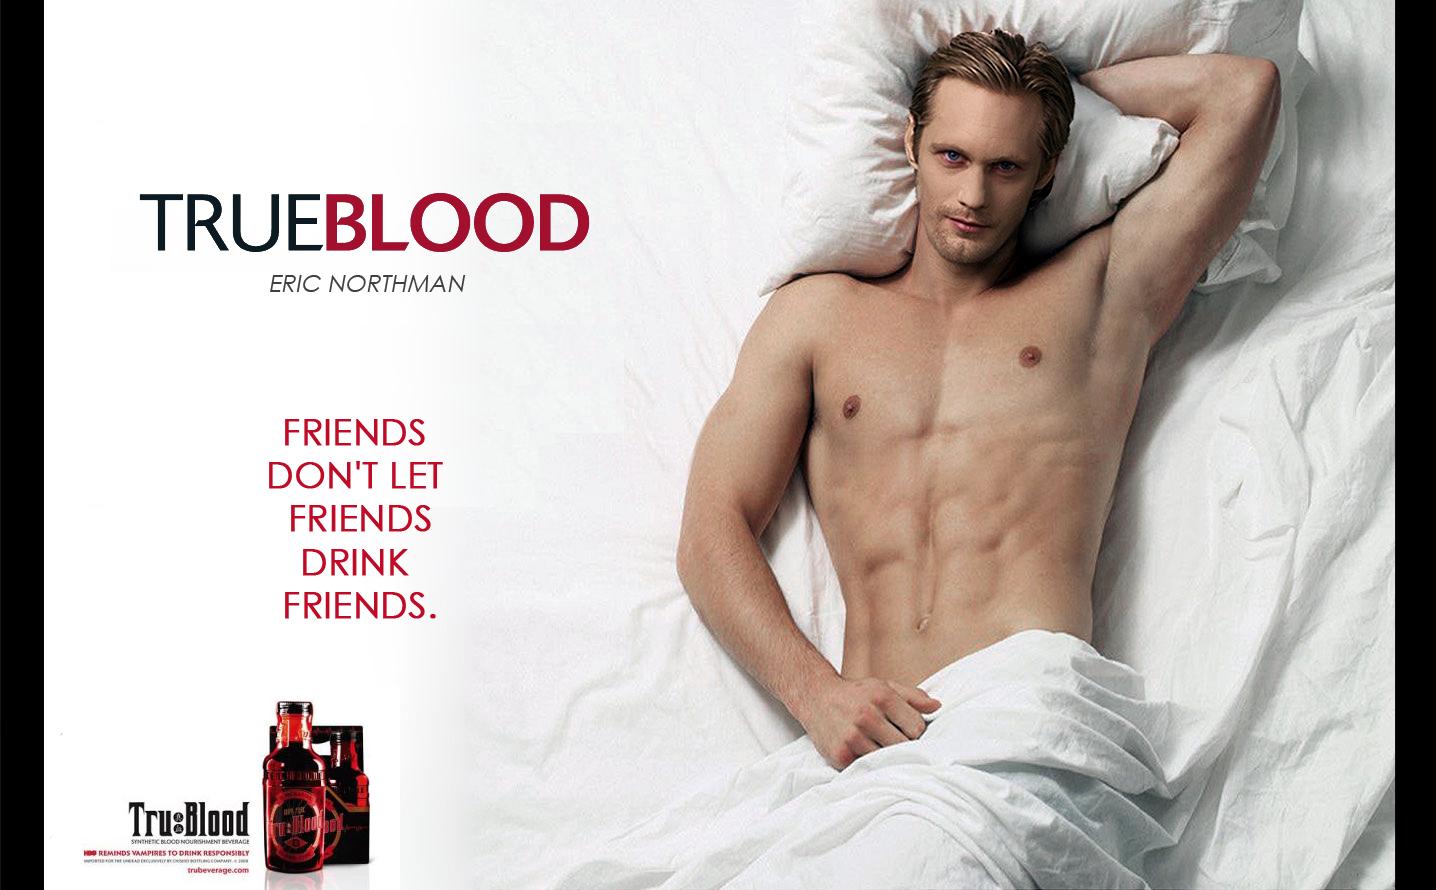 http://2.bp.blogspot.com/_Ebtg58yV3_E/TE1NshPMHFI/AAAAAAAAB_w/EdXXKbxEdsQ/s1600/True_Blood__Eric_Northman_by_ilovedrigo4ever.png